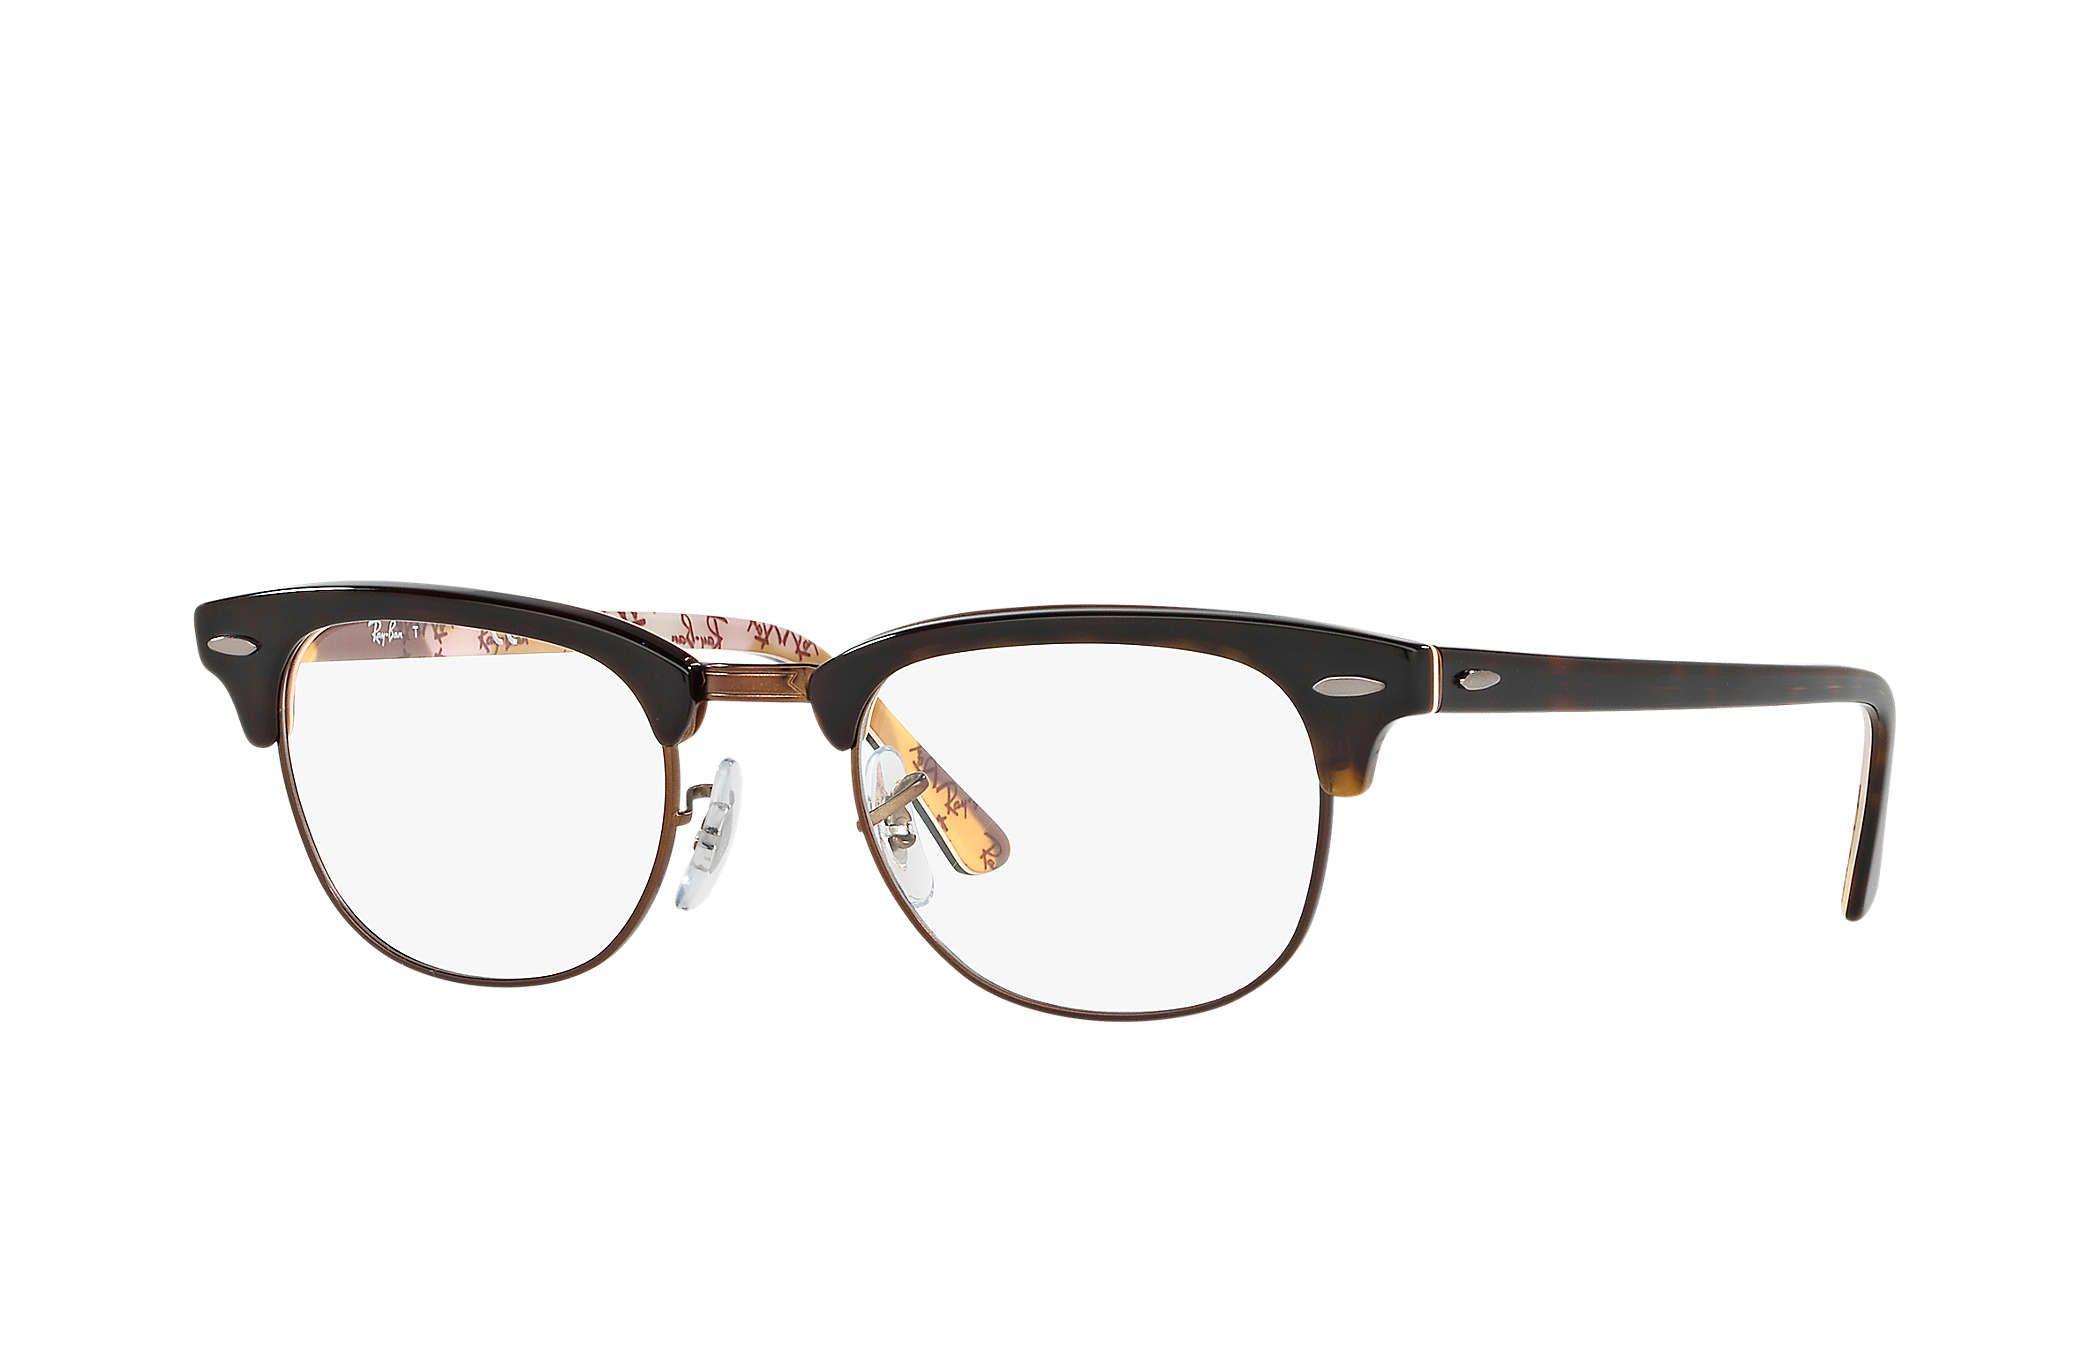 8989730c60 Ray-Ban 0RX5154-Clubmaster Optics Tortoise